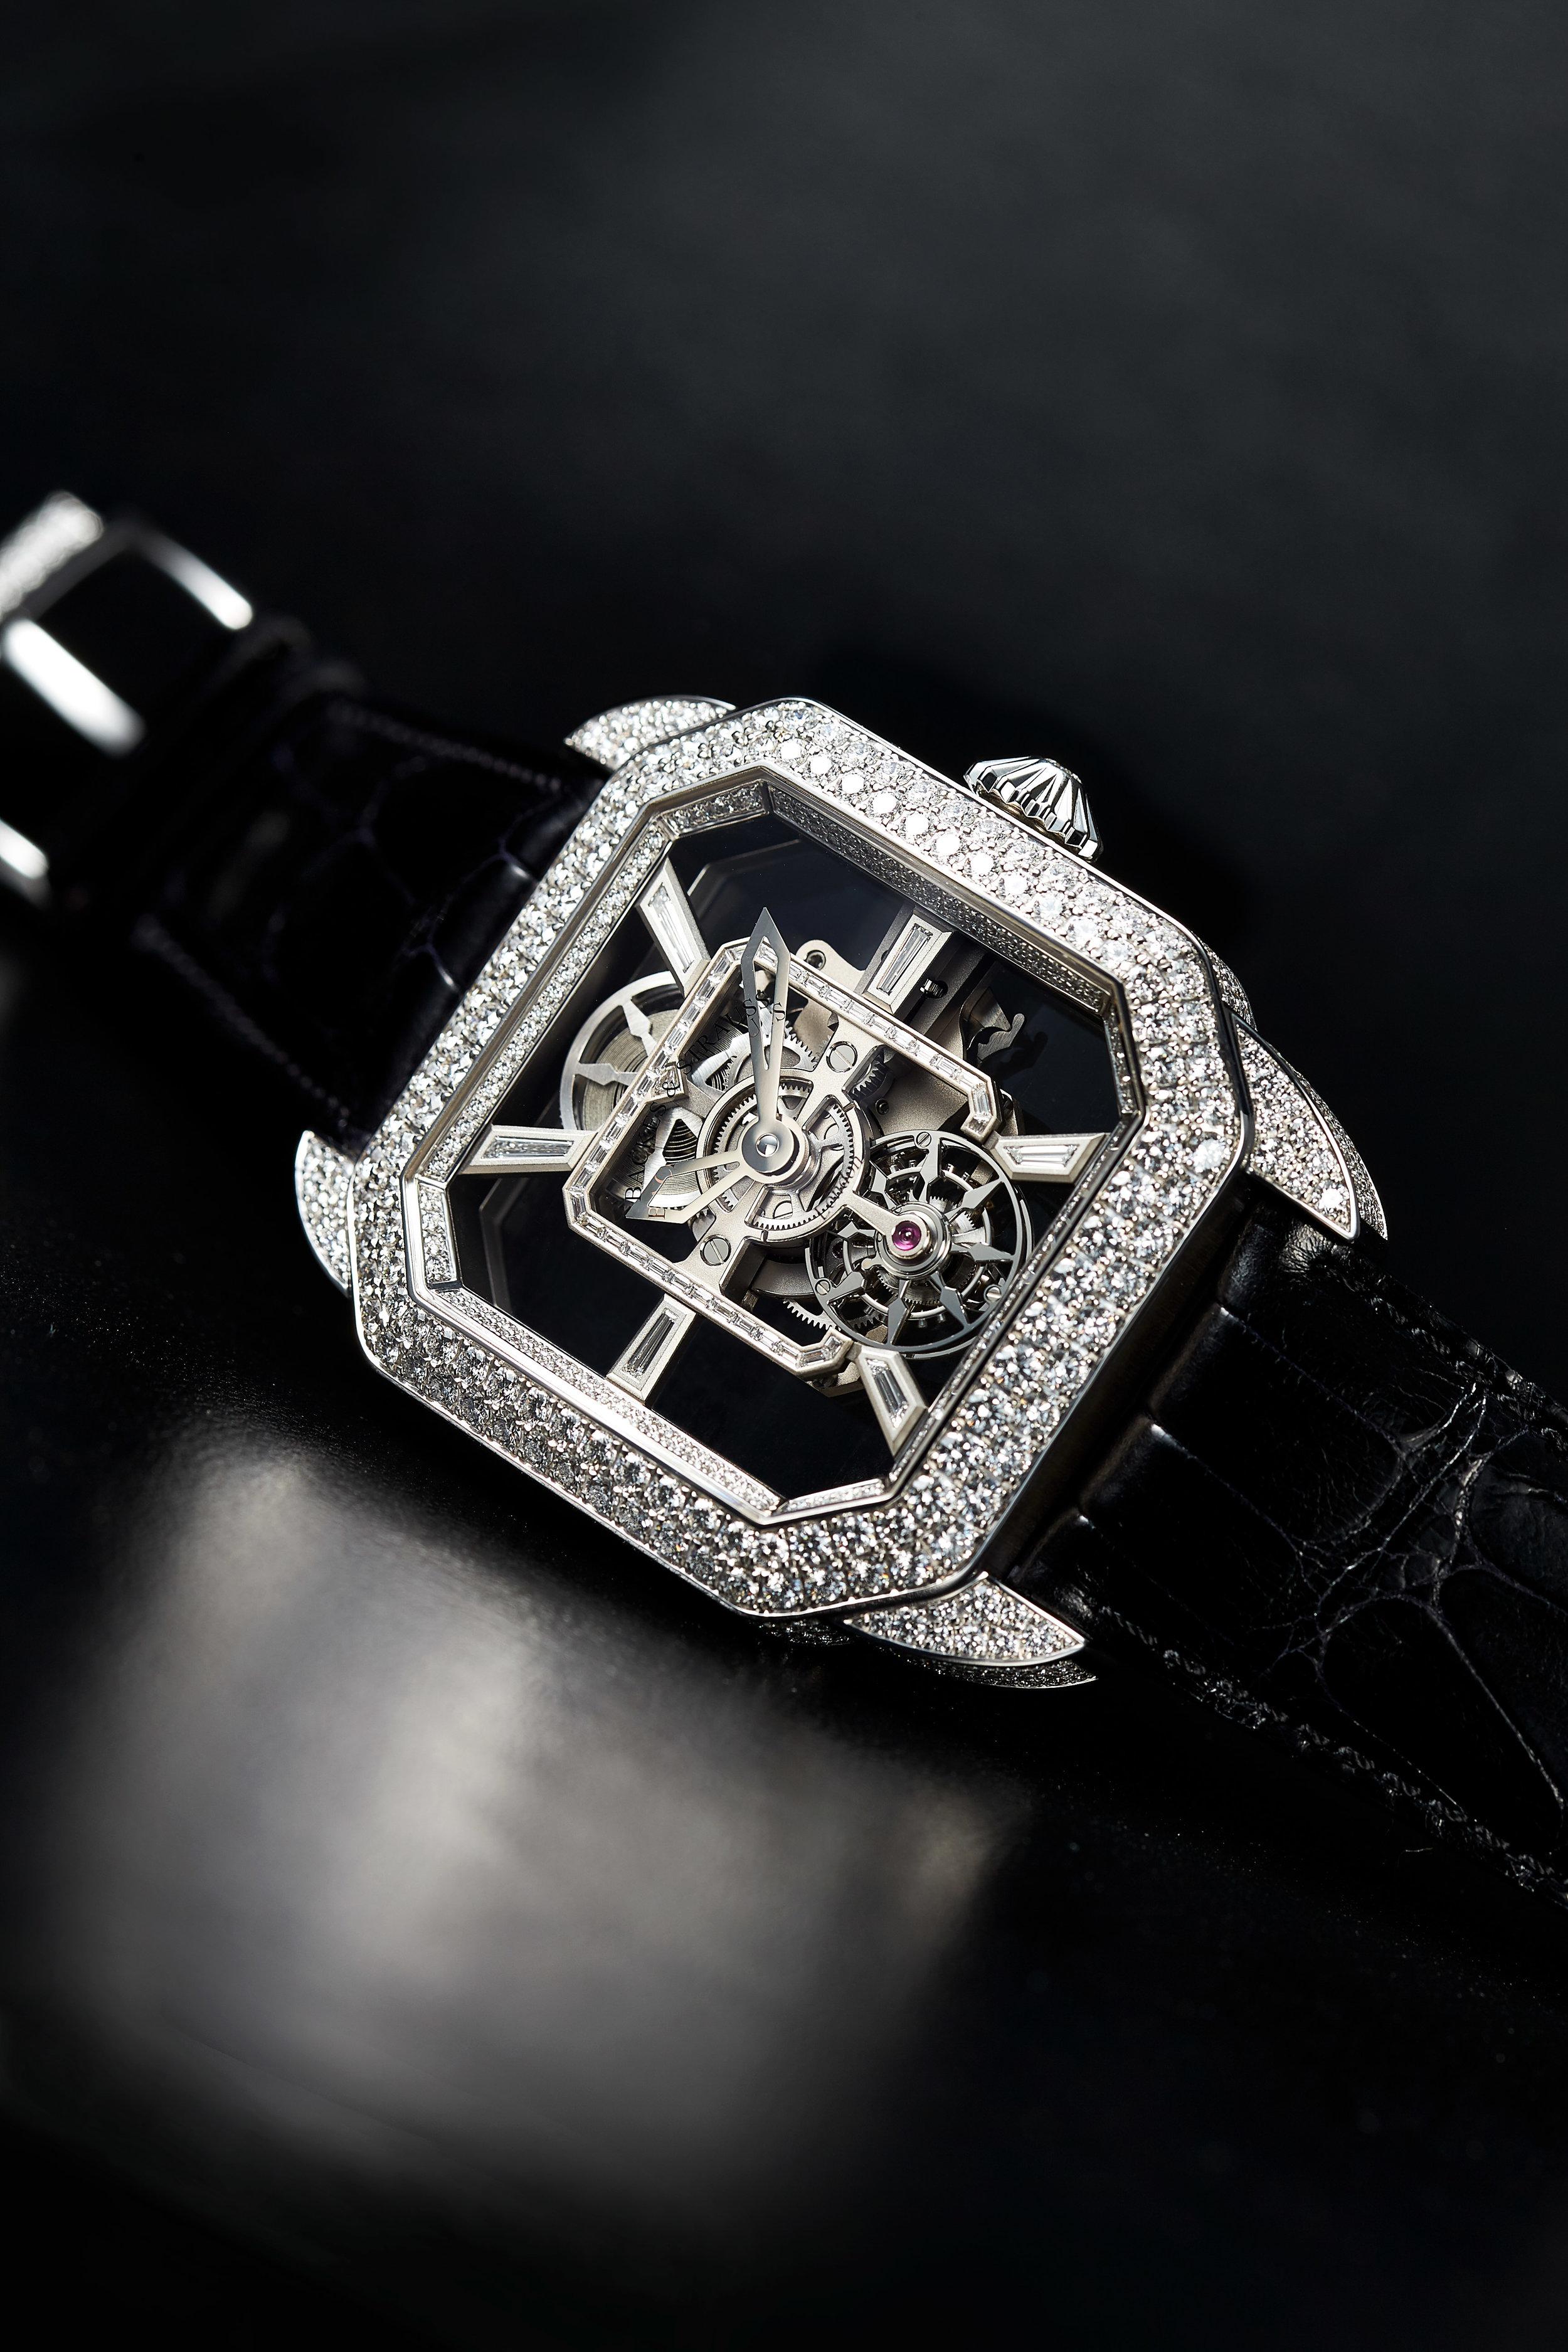 Berkeley Emperor Brilliant Tourbillon 45 diamond watch side-shot